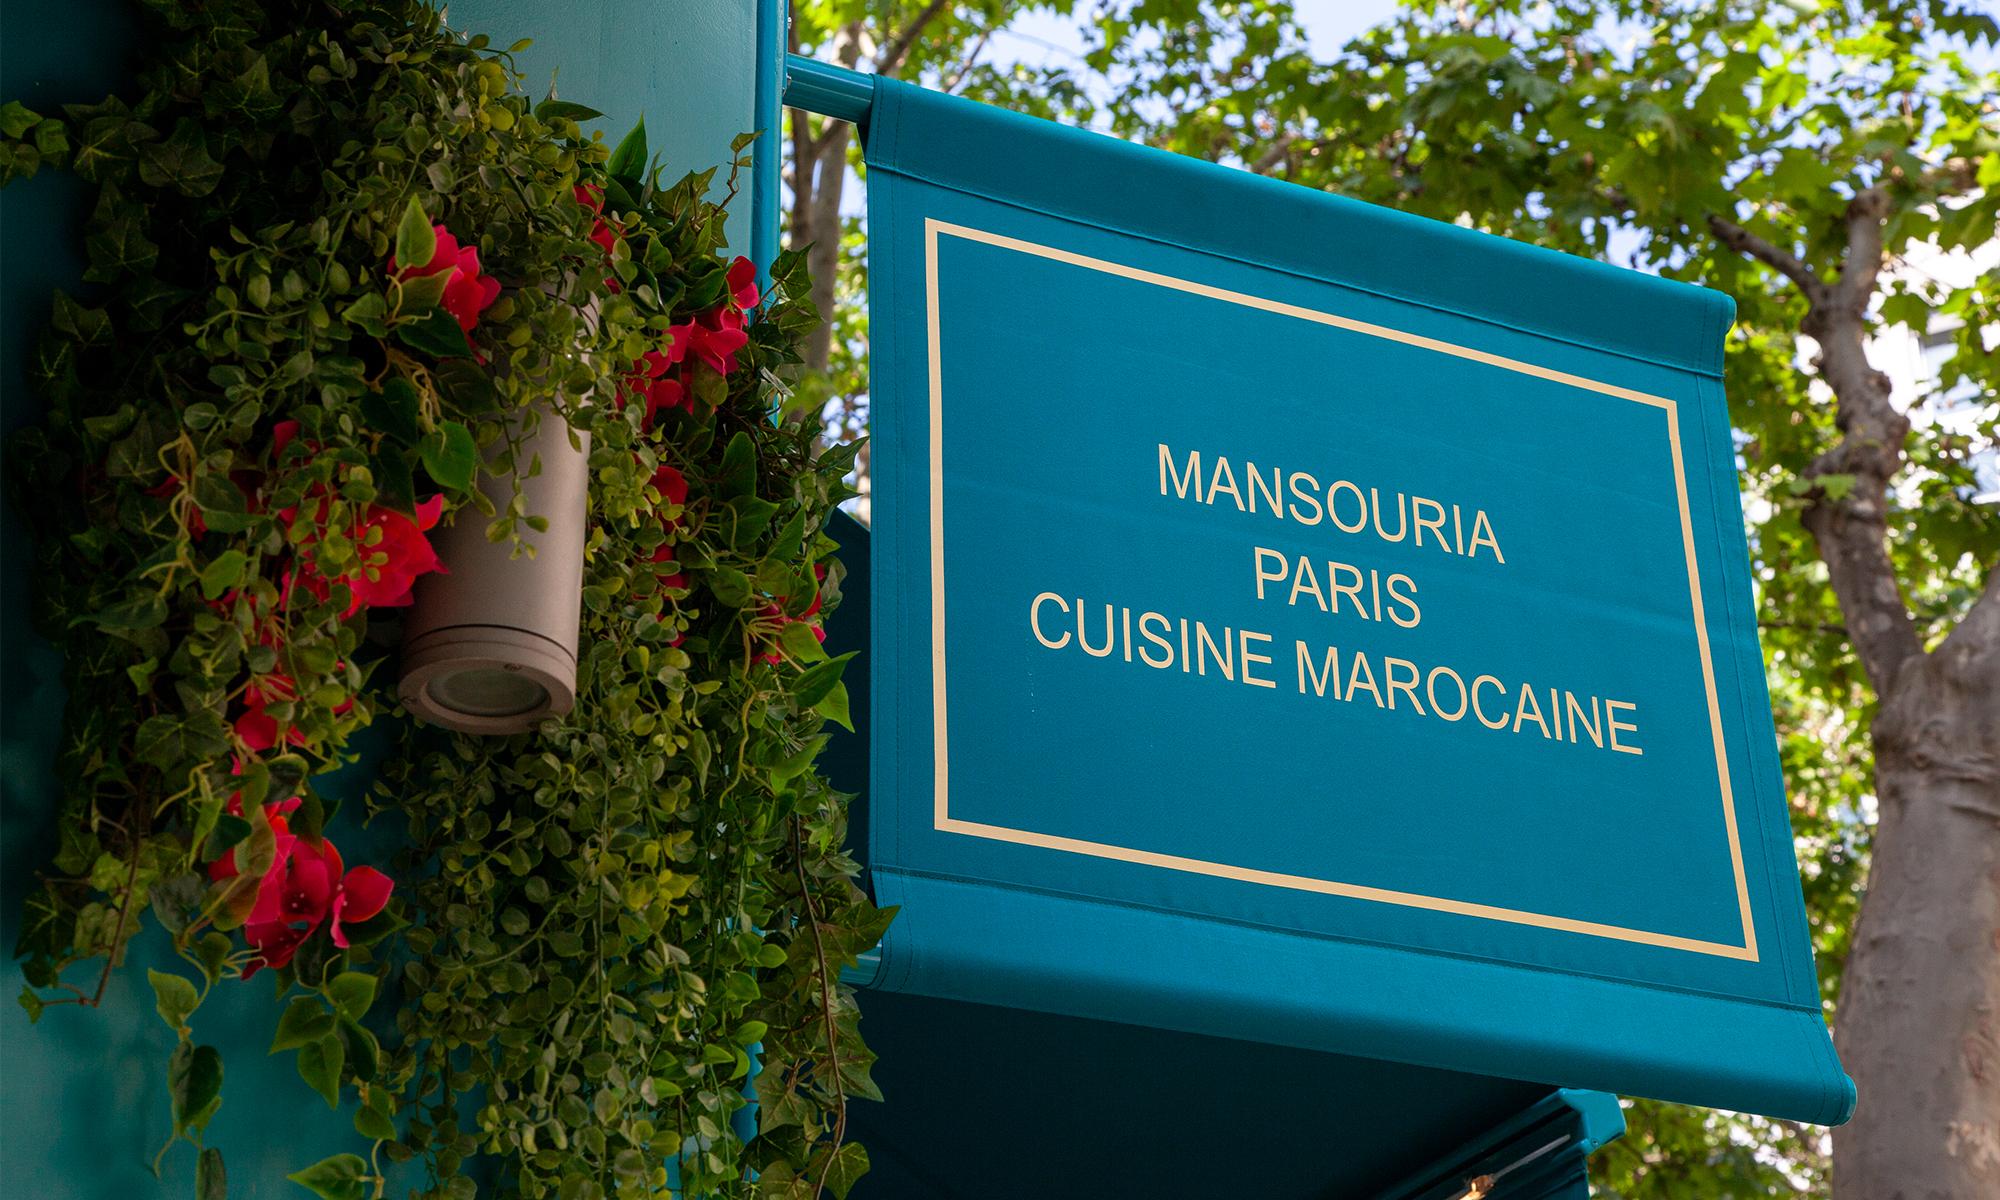 Mansouria